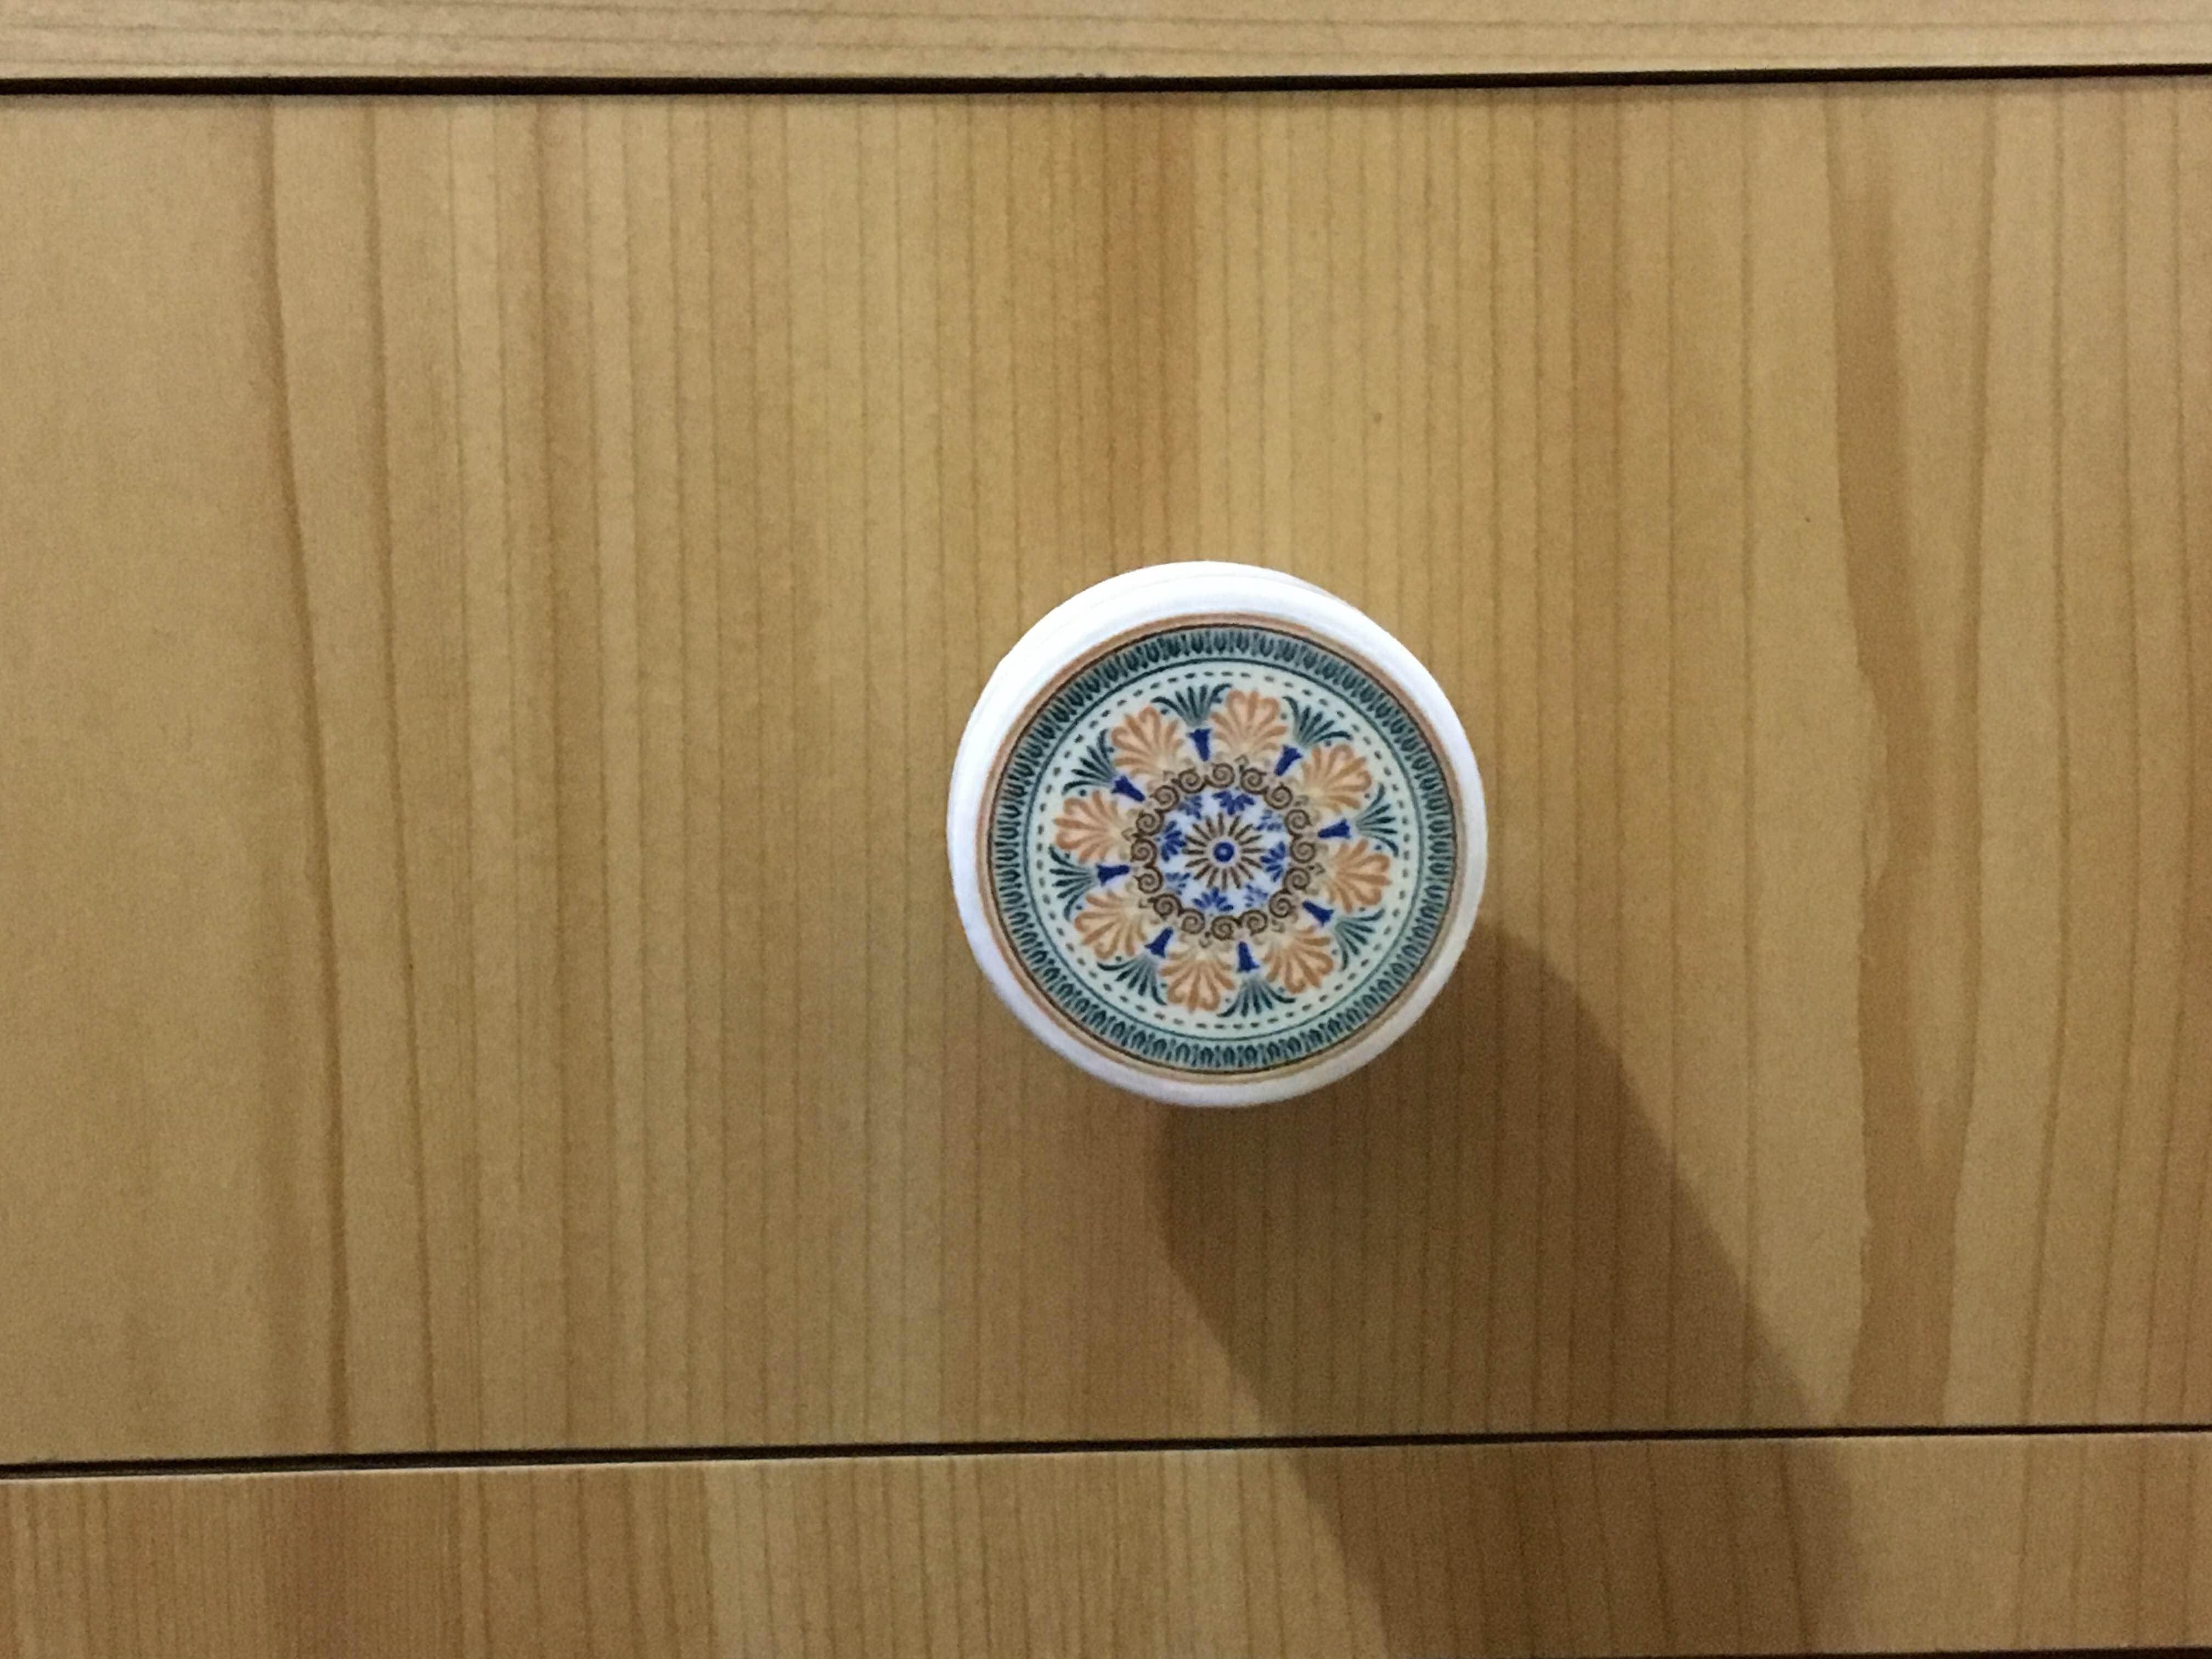 Puxador estilo Porcelana Mandala  Arte Capricho  Elo7